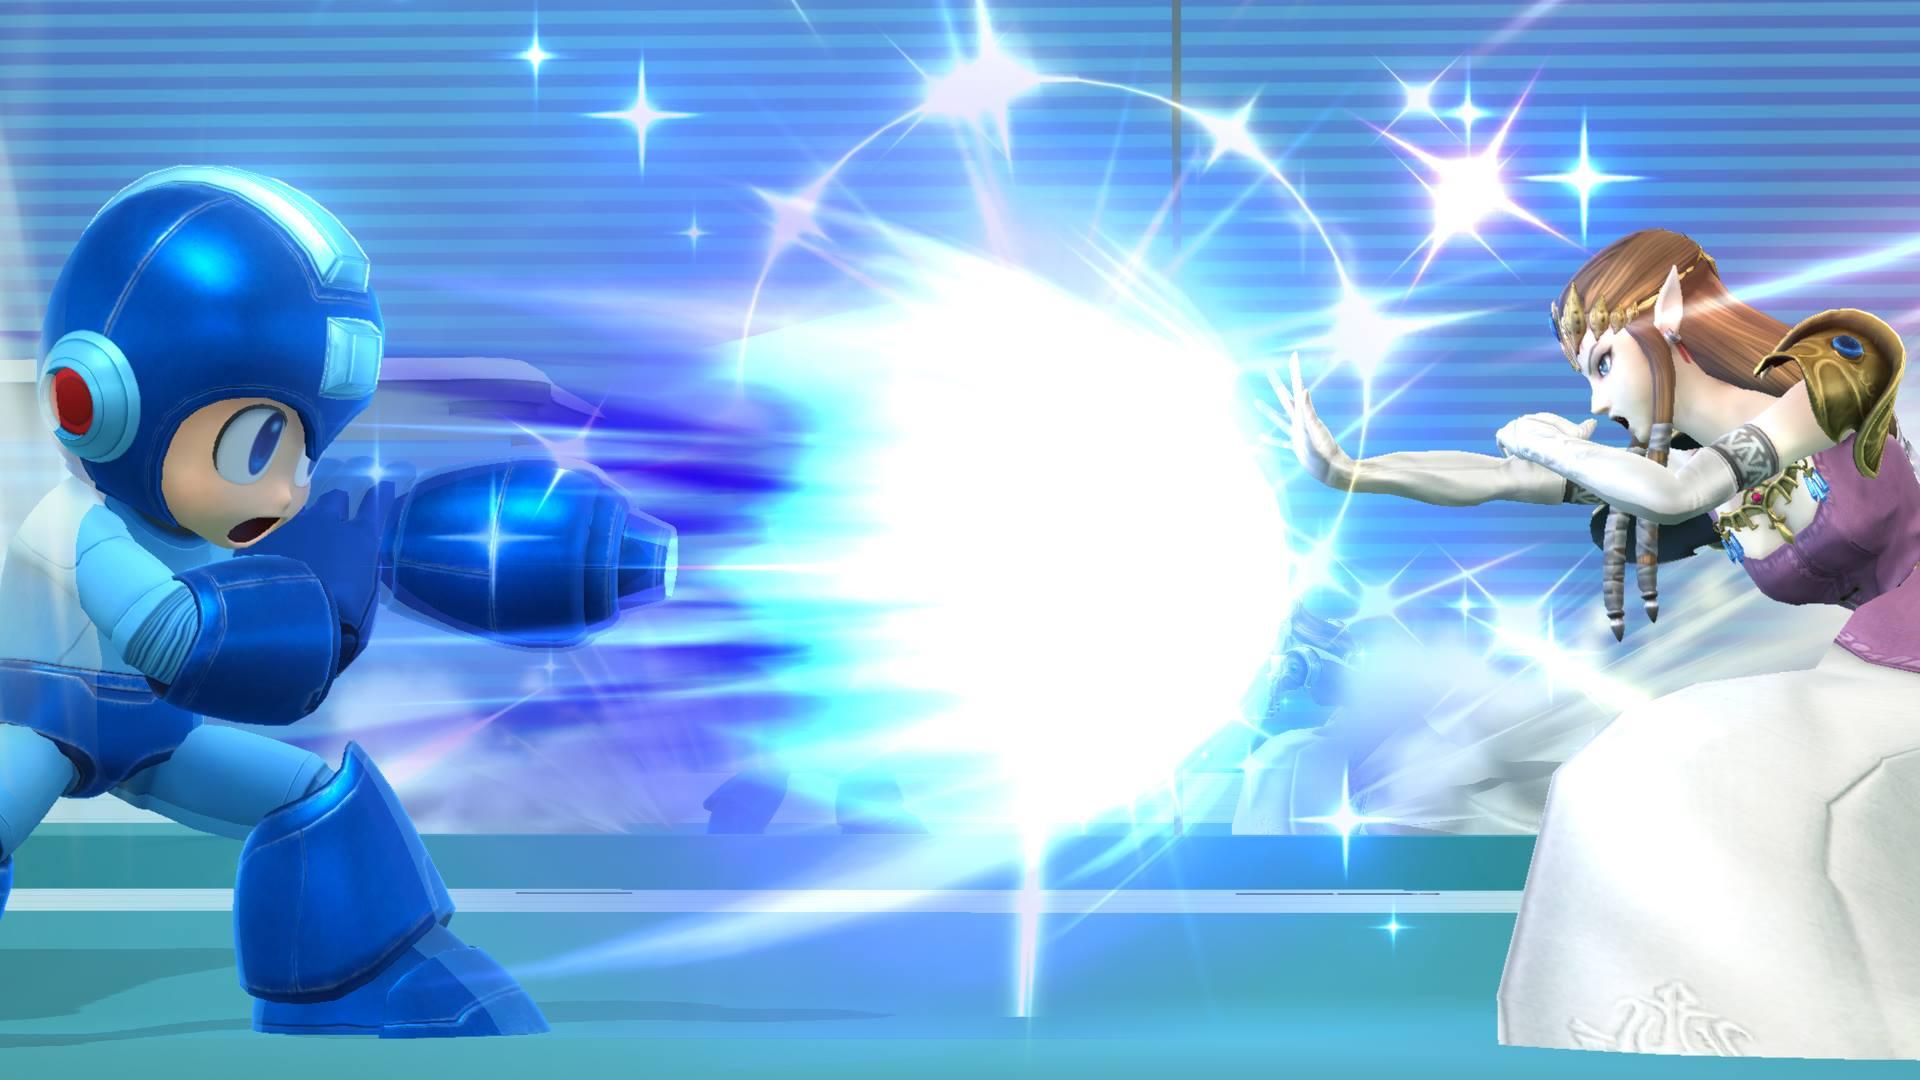 Über 20 Screenshots stellen Zelda in Super Smash Bros. Wii U/3DS ...